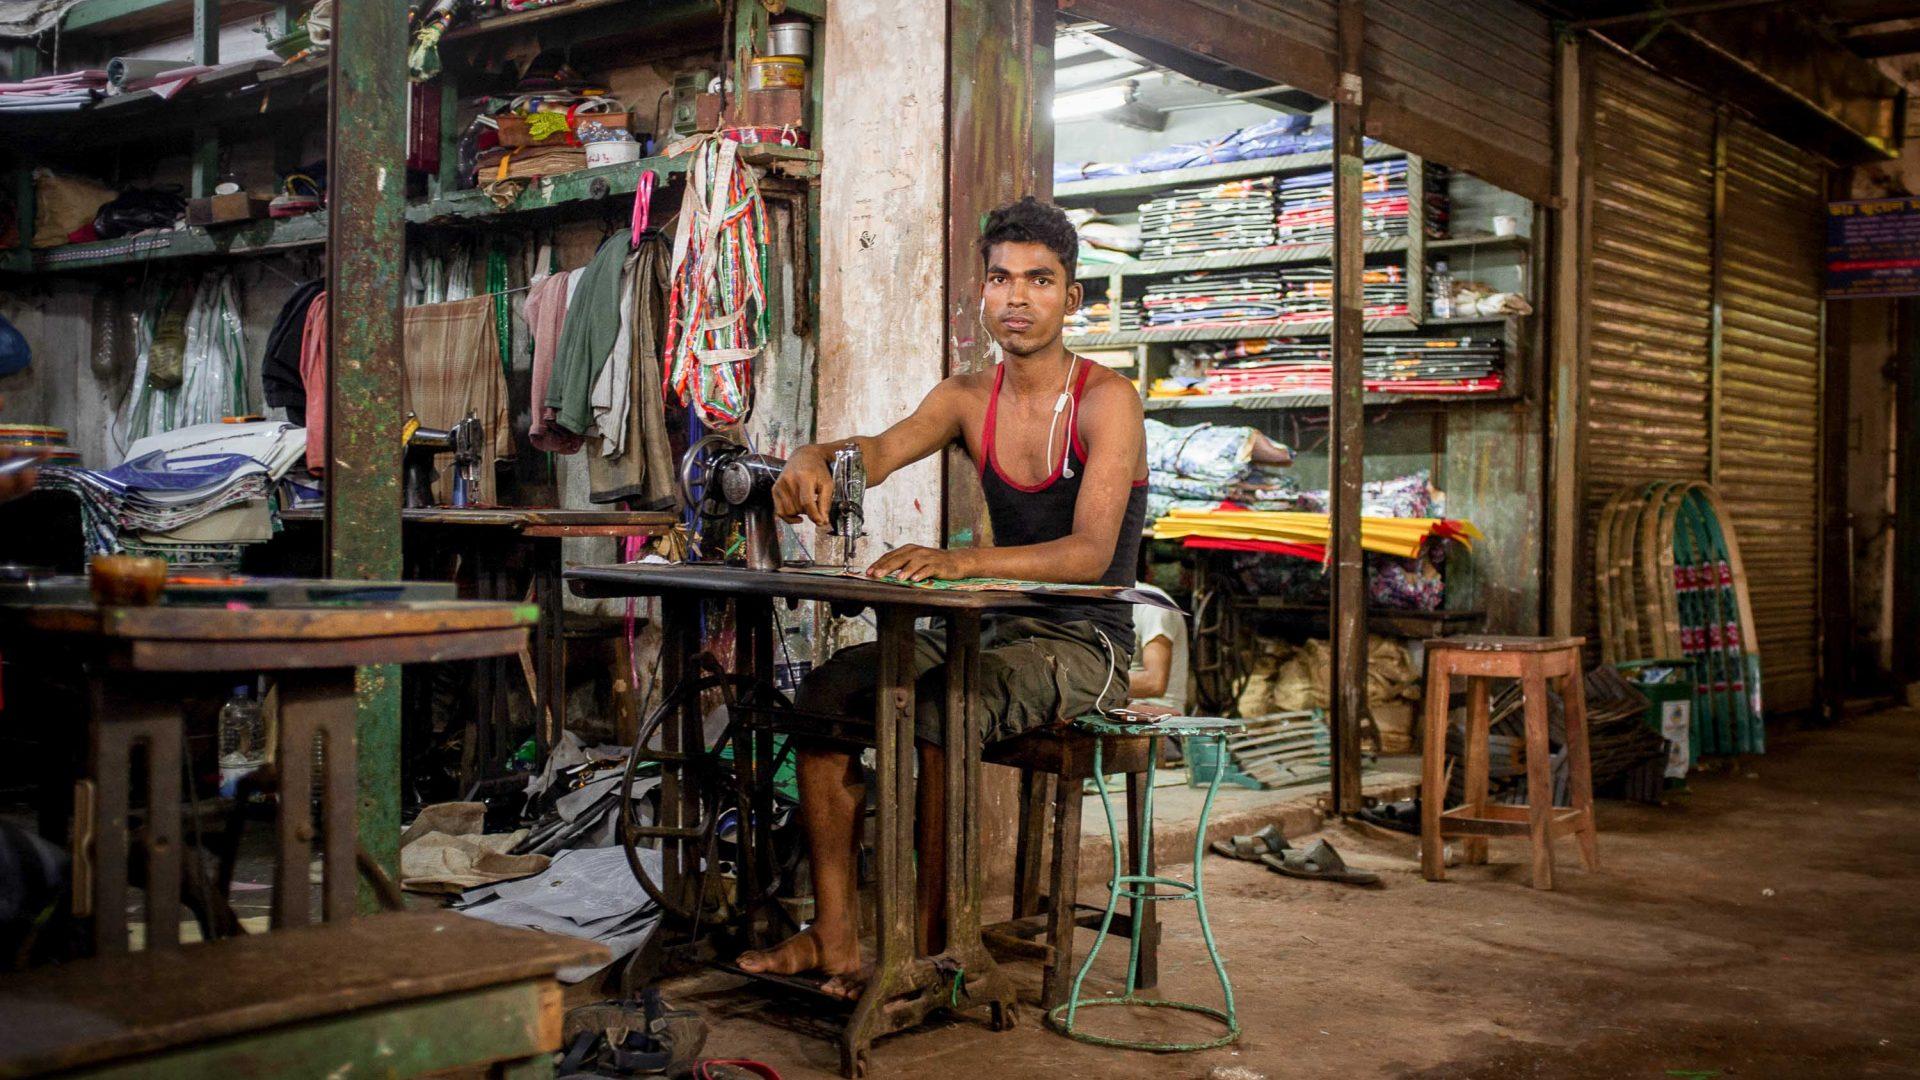 A sewing workshop in Bangladesh.